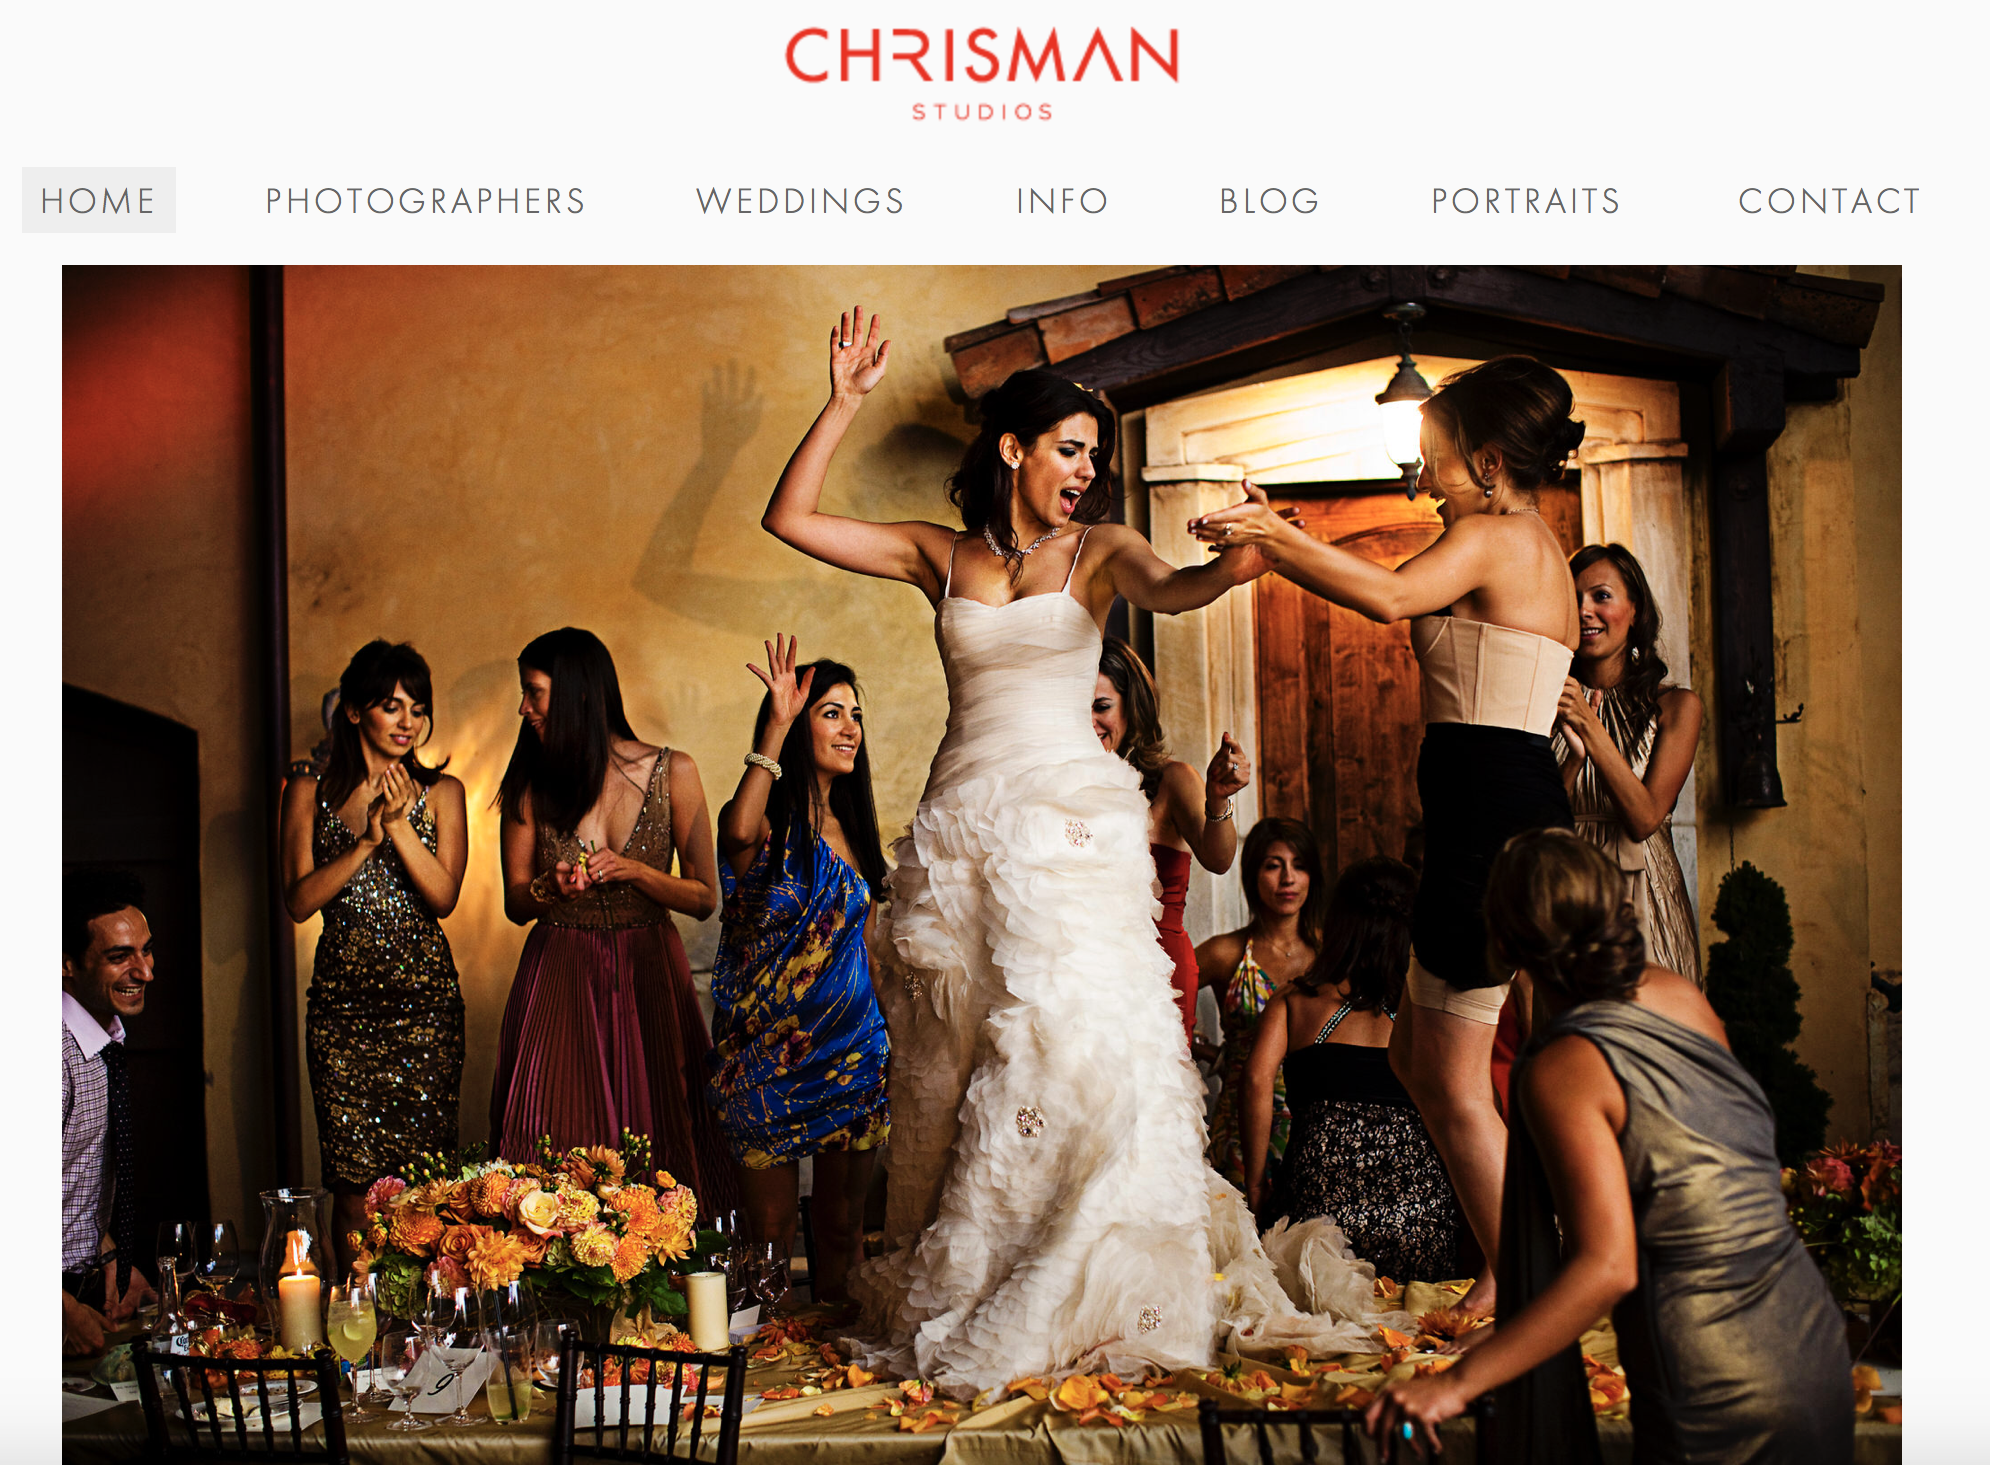 An image of the website of wedding photographers Chrisman studios.